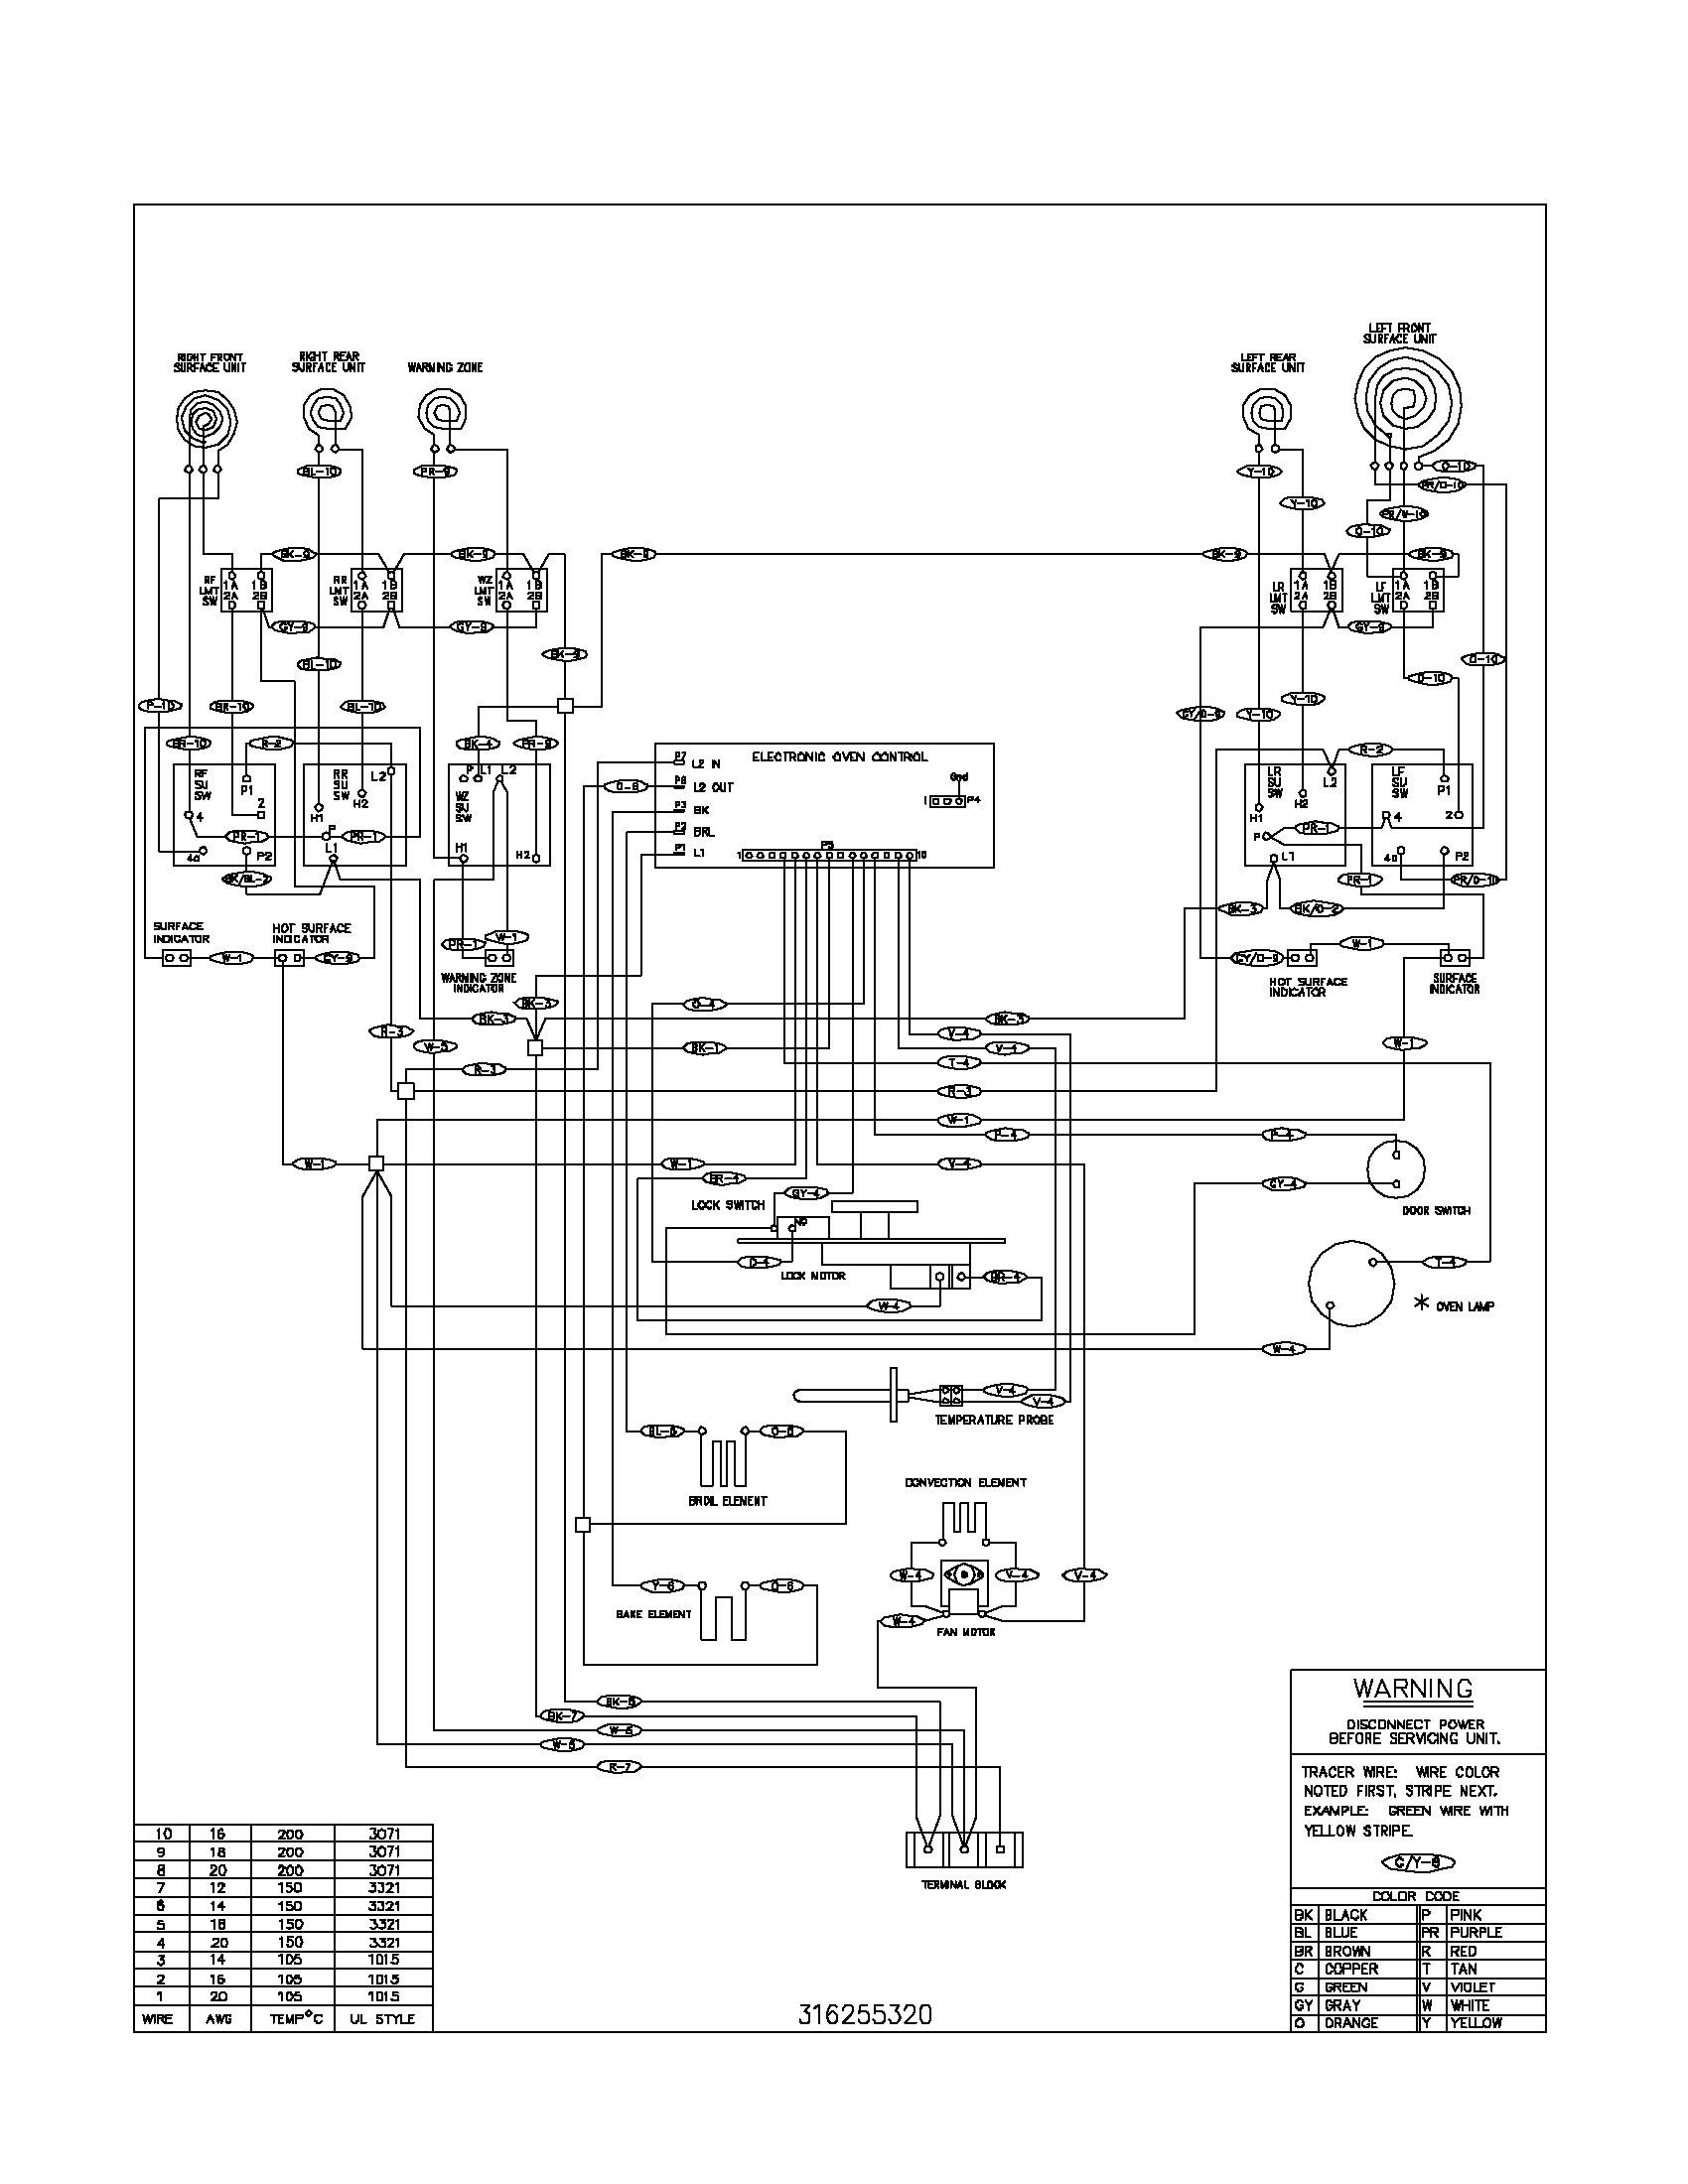 Basic House Wiring Diagram Bpm Mac Parts